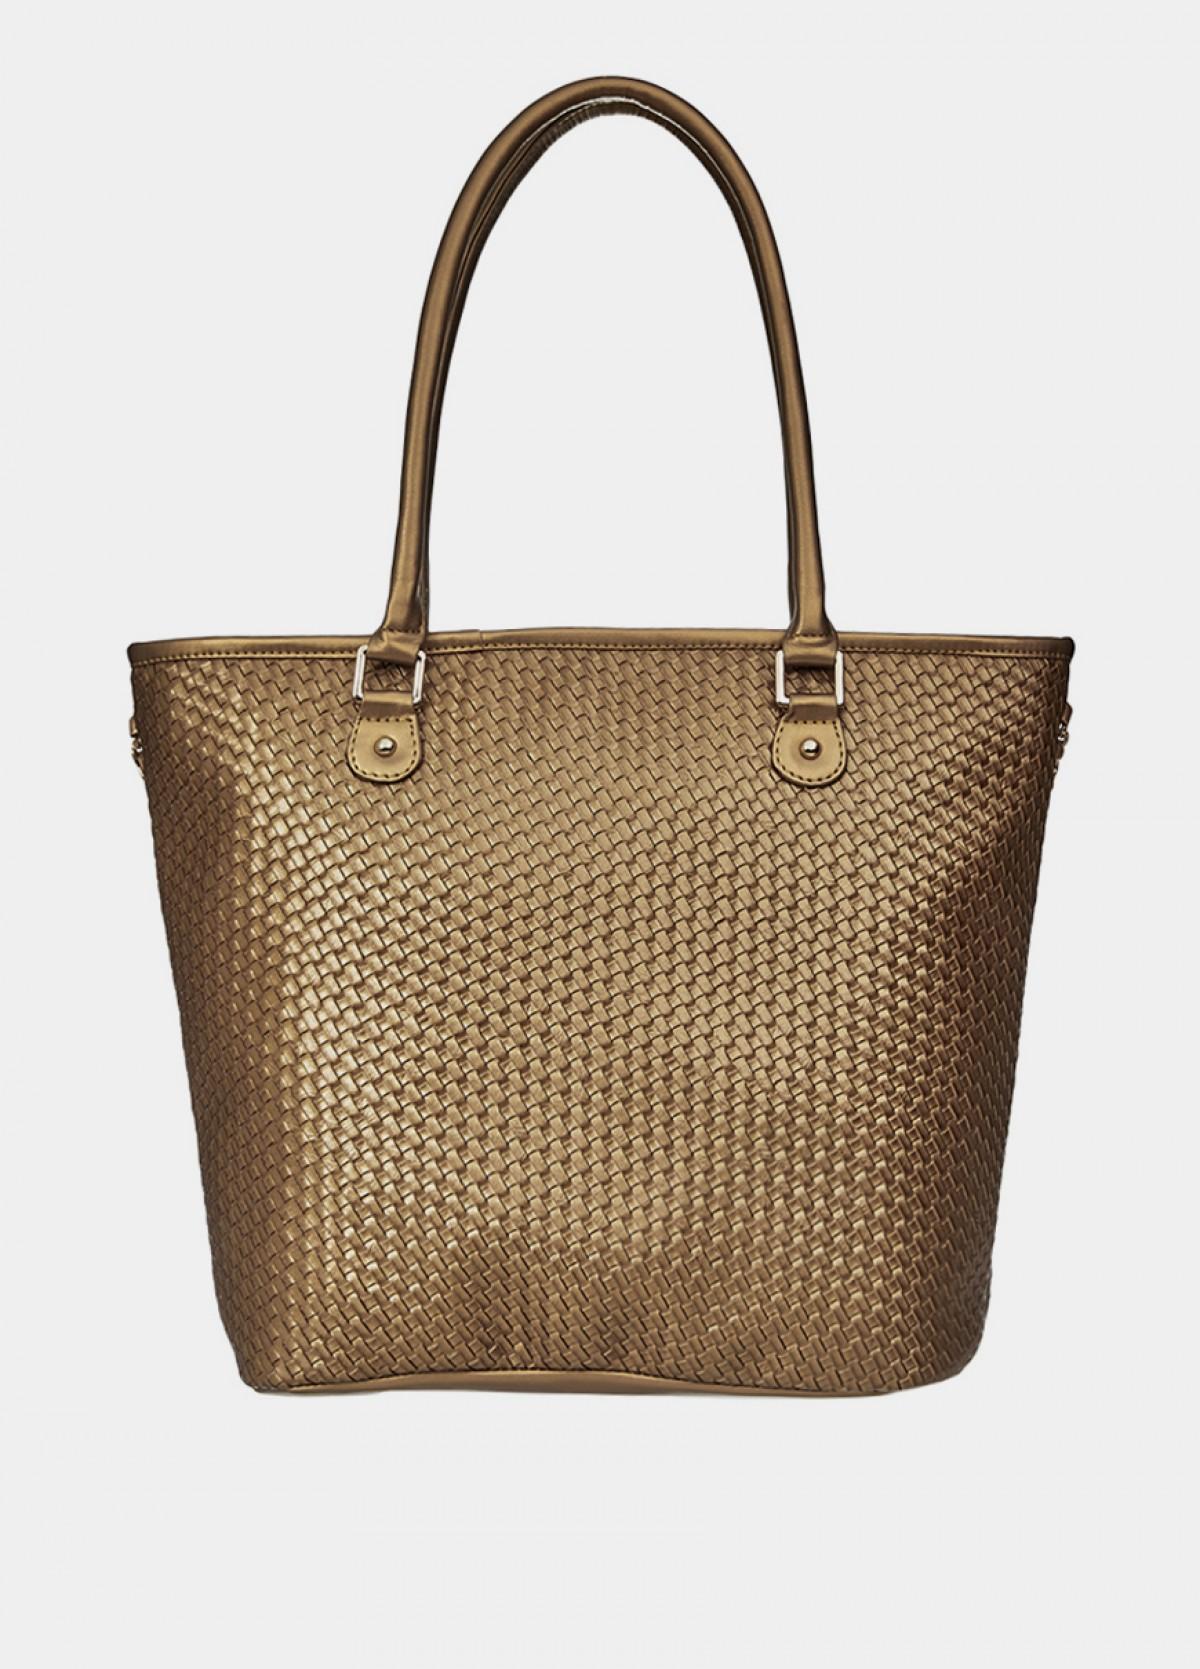 The Elegant Shopper Bag